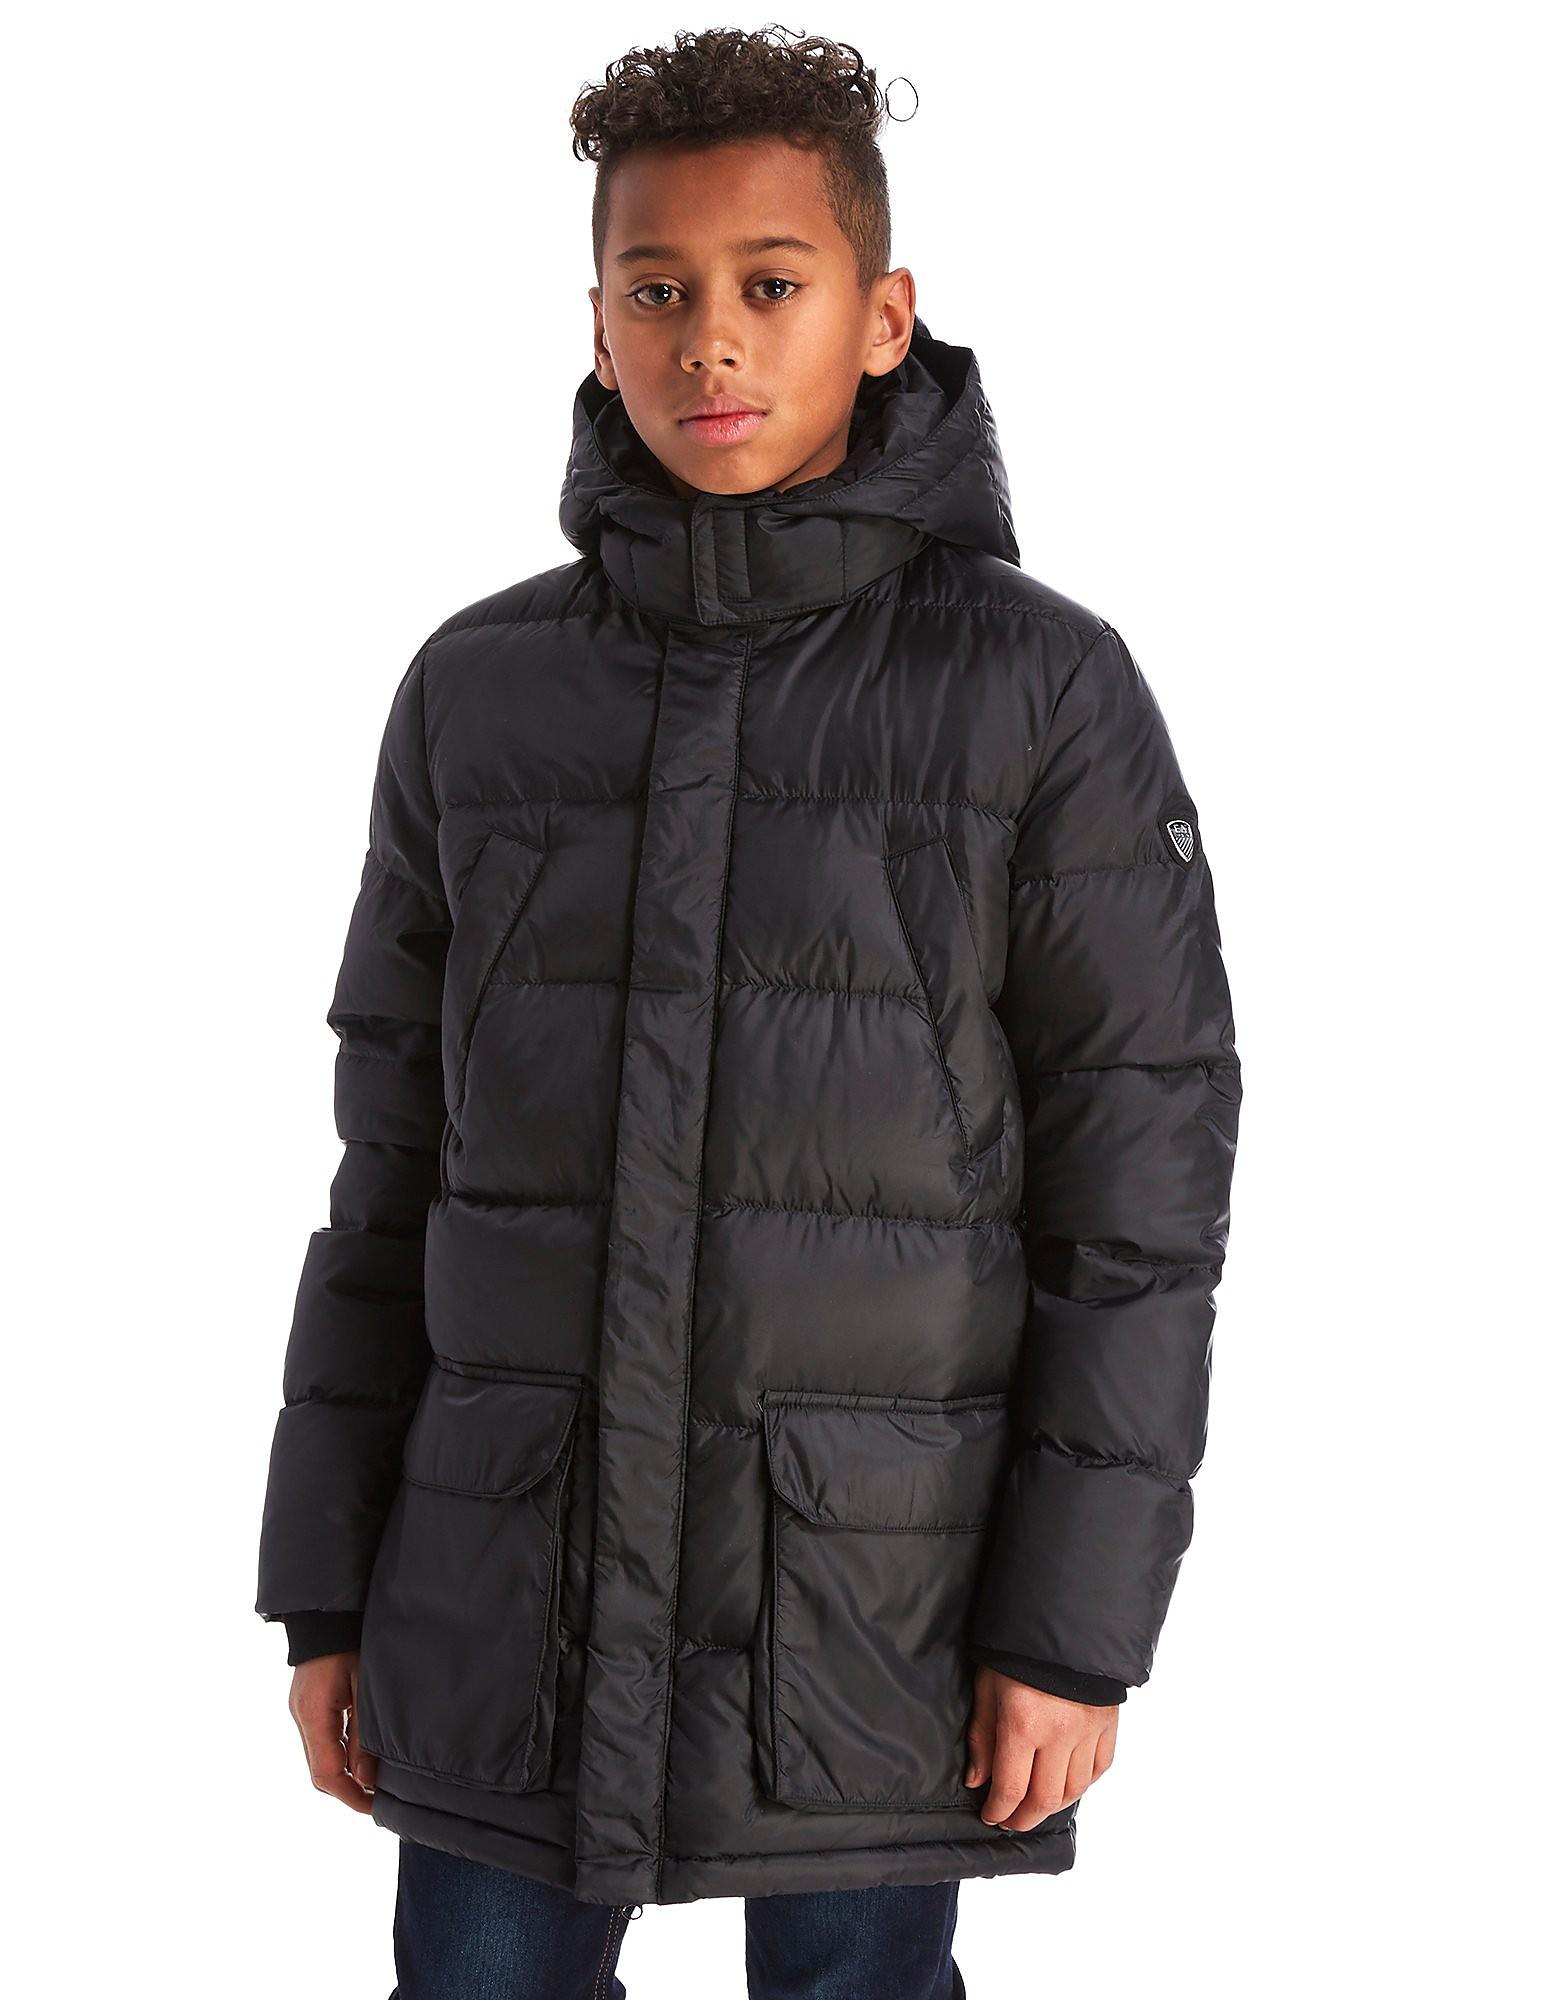 Emporio Armani EA7 Mountain Parka Jacket Junior